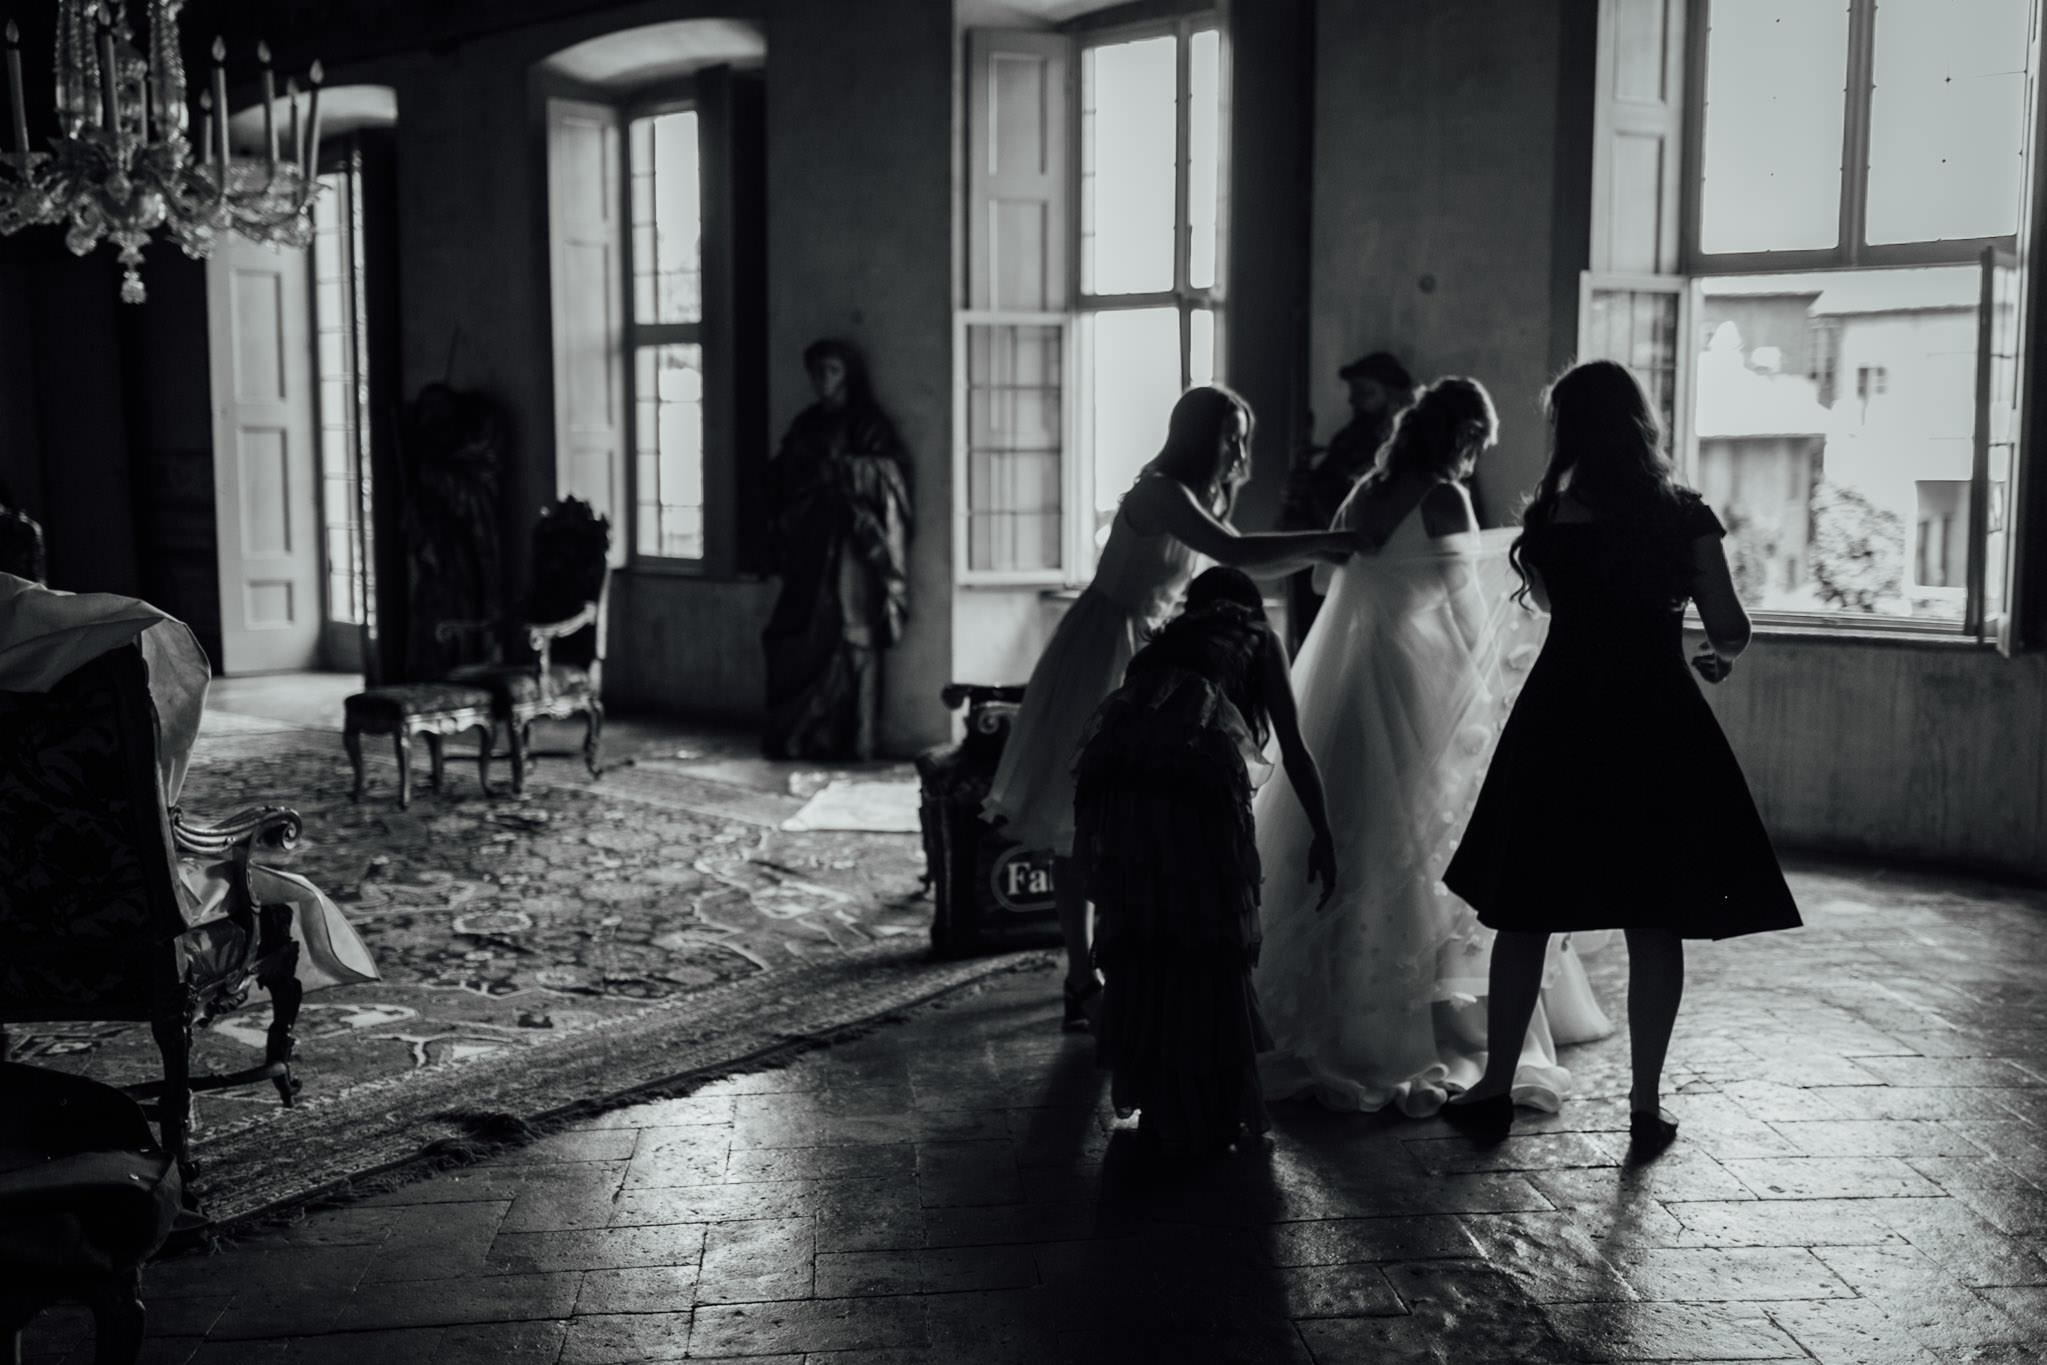 fotografia_di_matrimonio_portfolio-1053